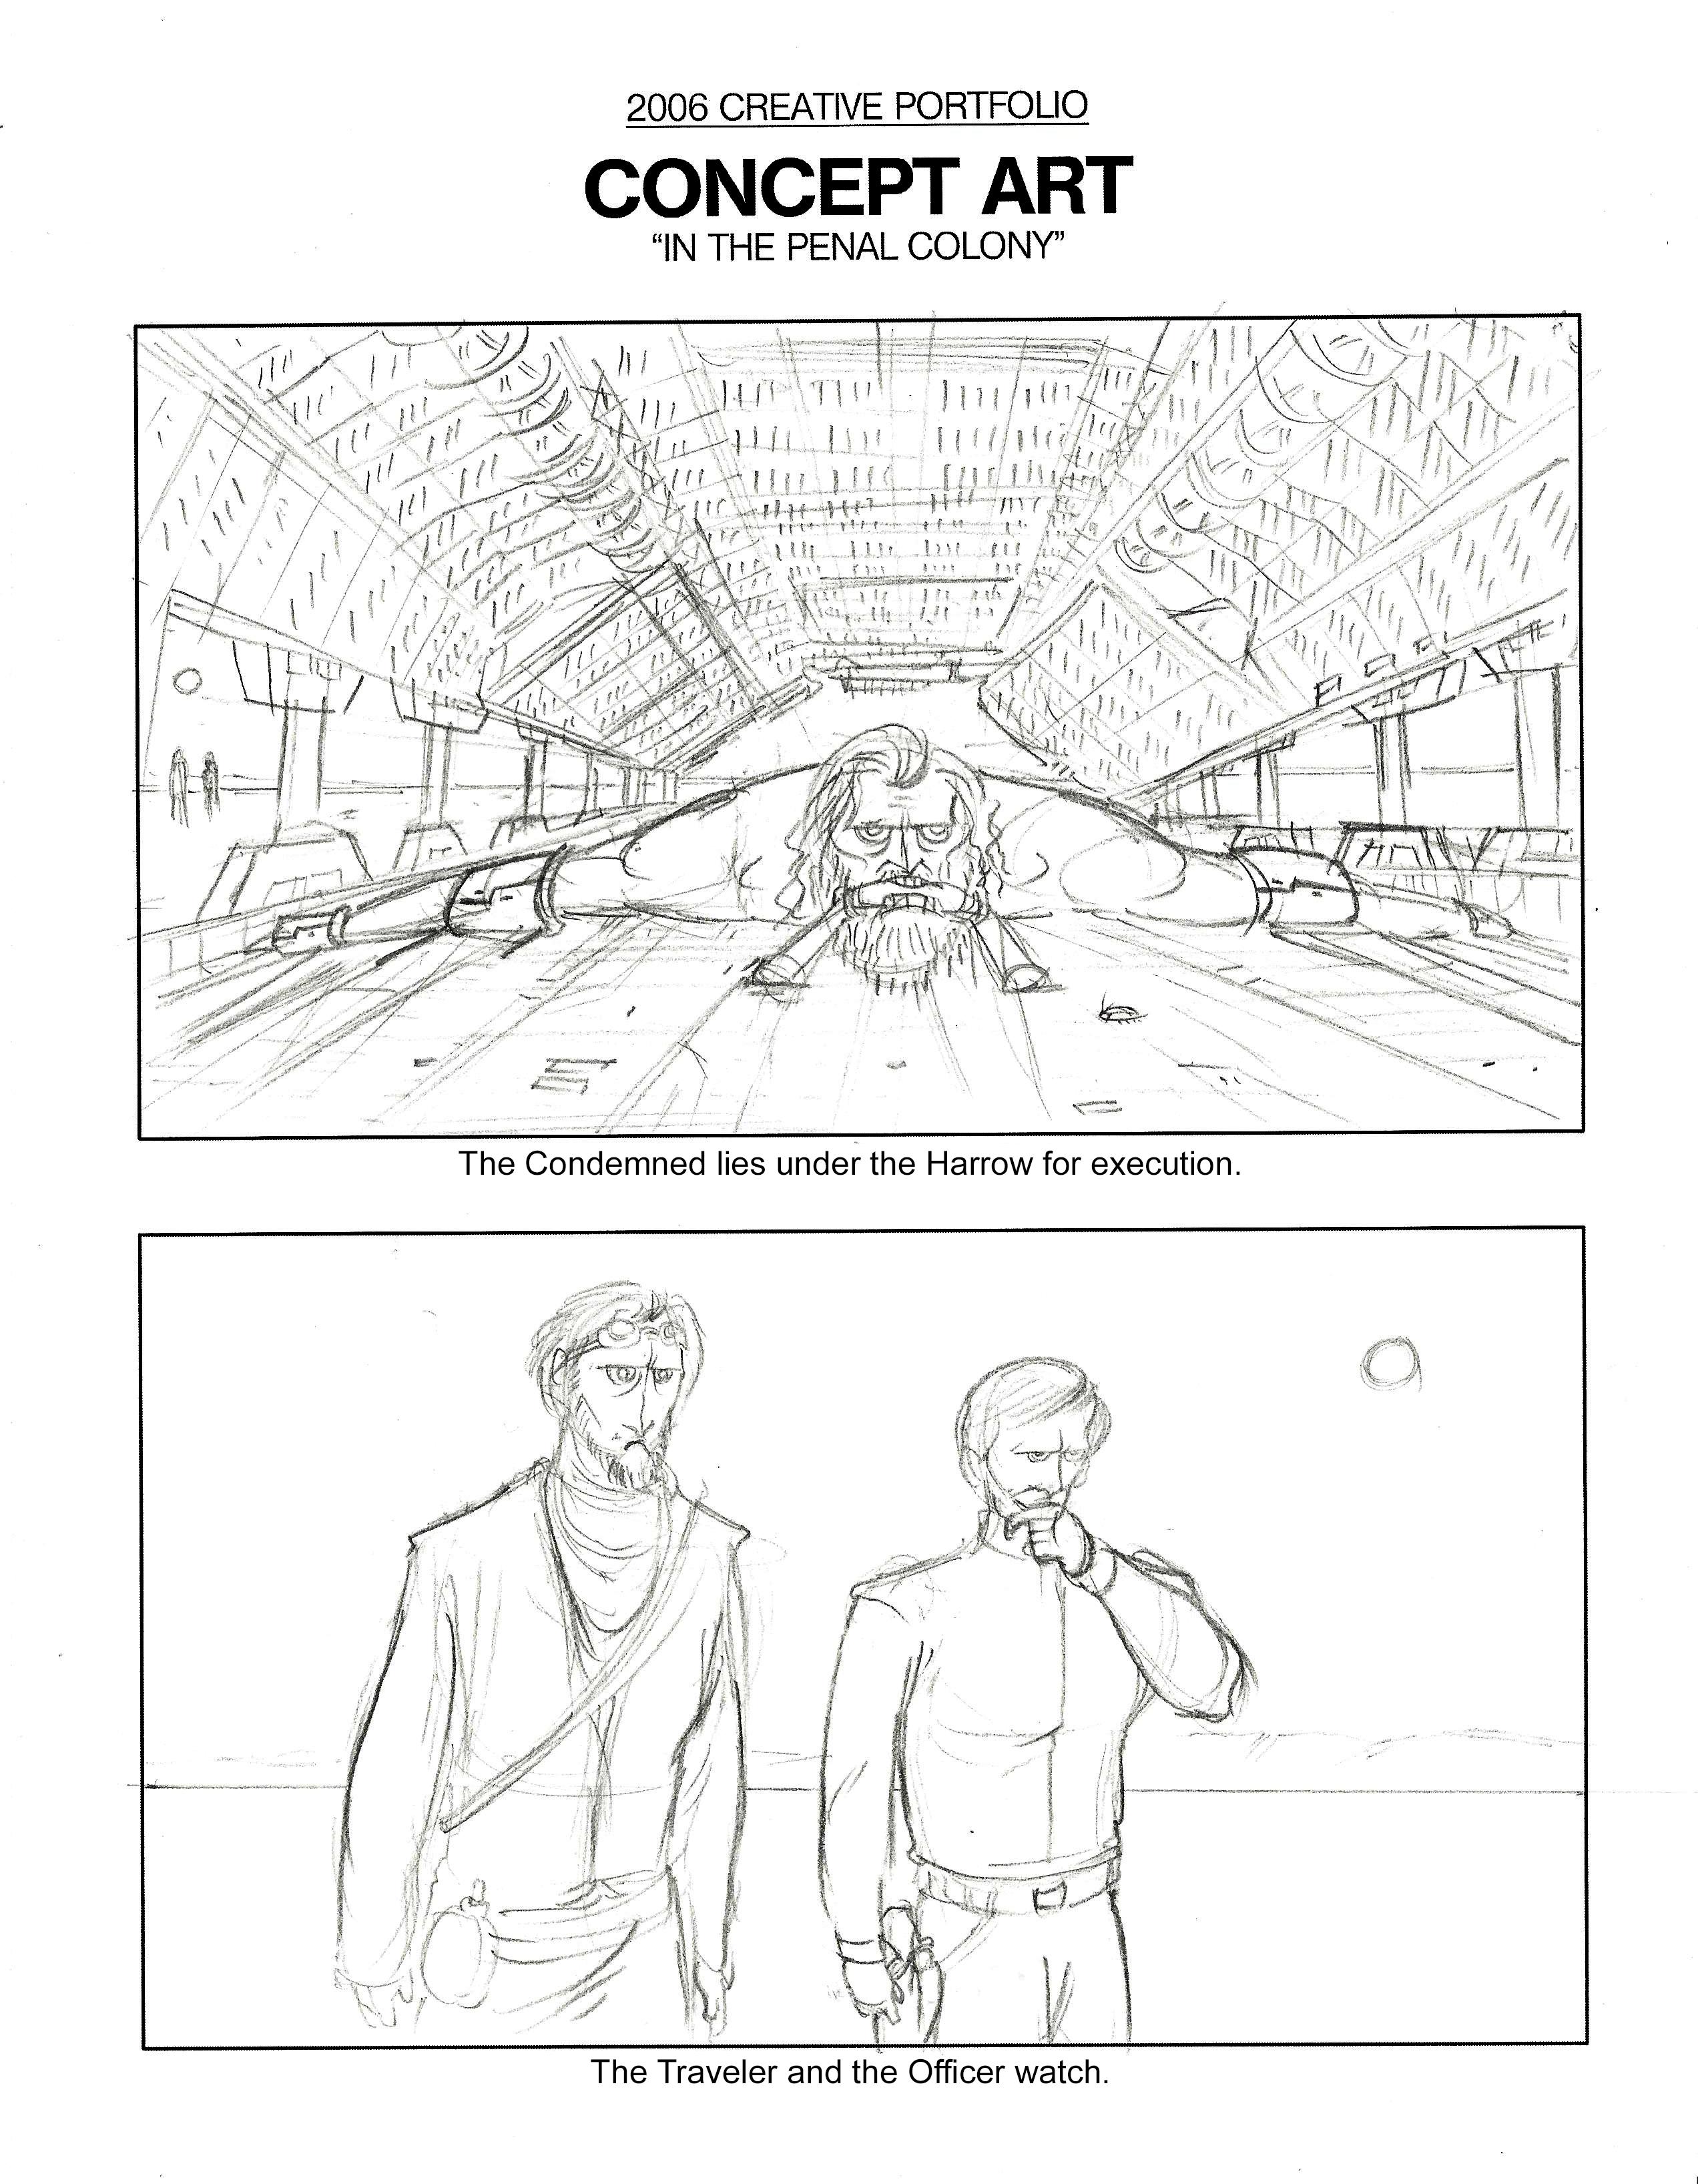 UCF Creative Portfolio - Concept Art